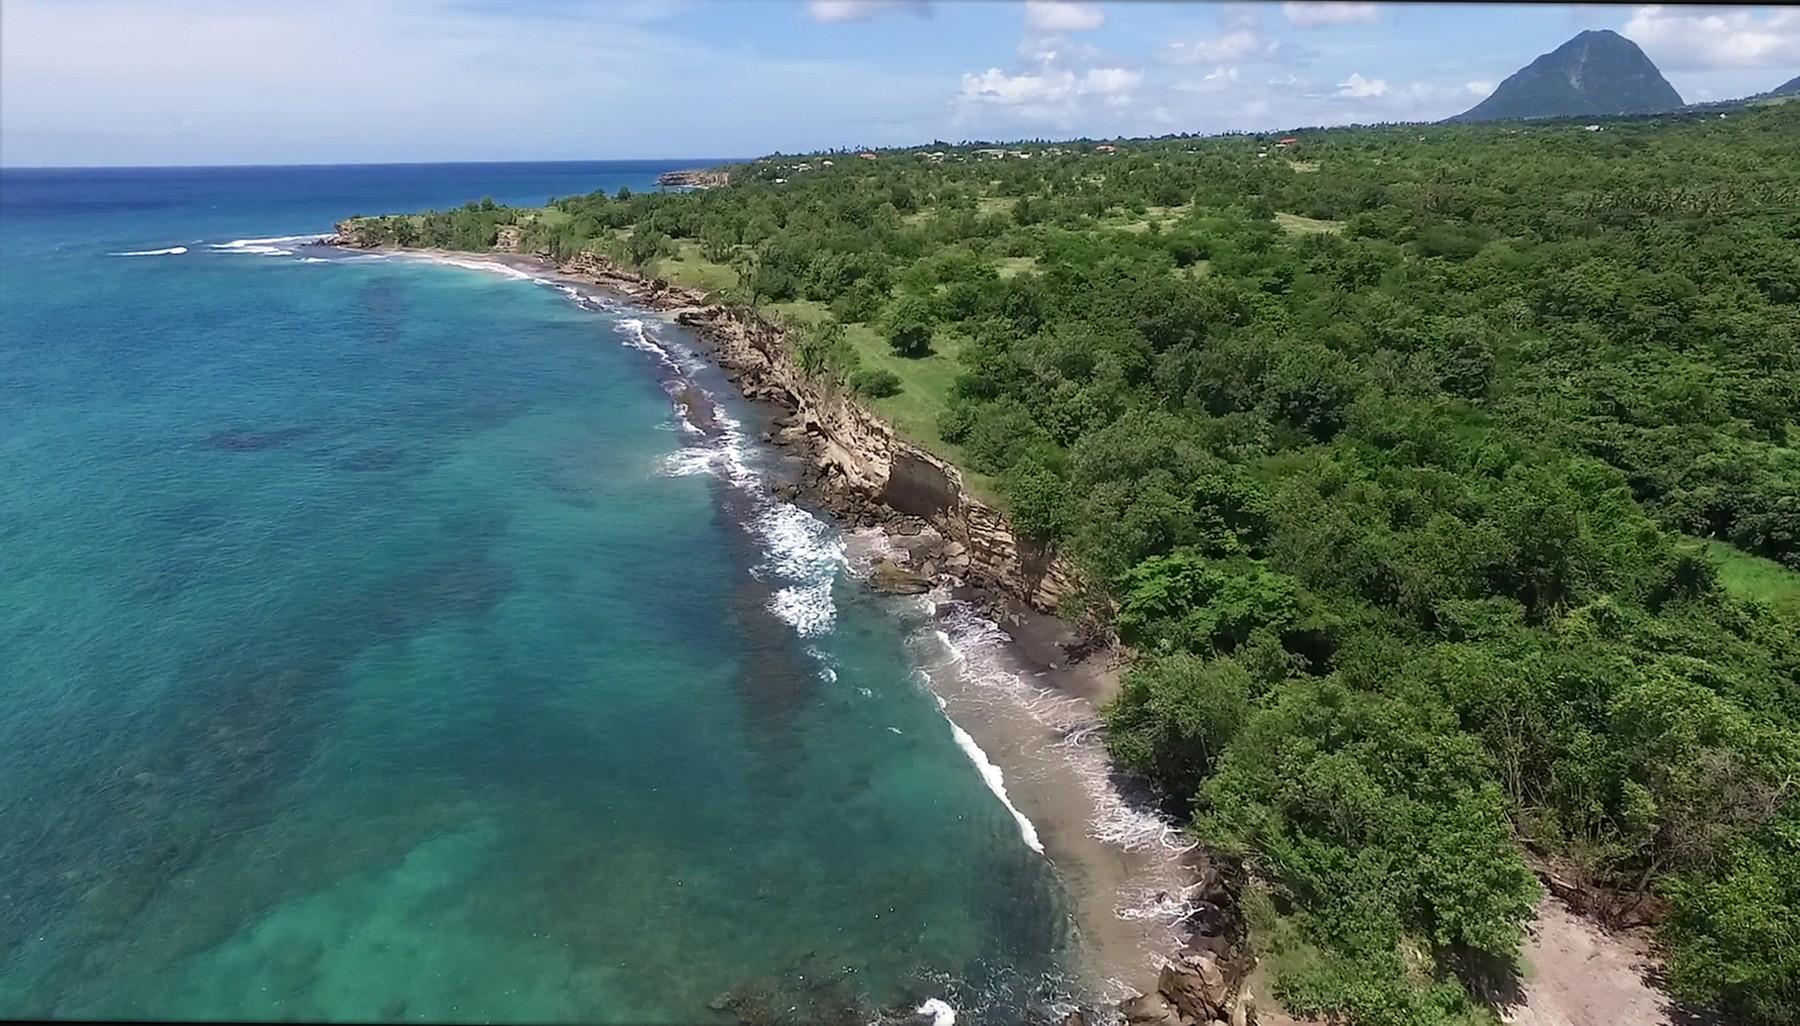 Land for Sale at Saphyr Estate Laborie, Laborie, St. Lucia